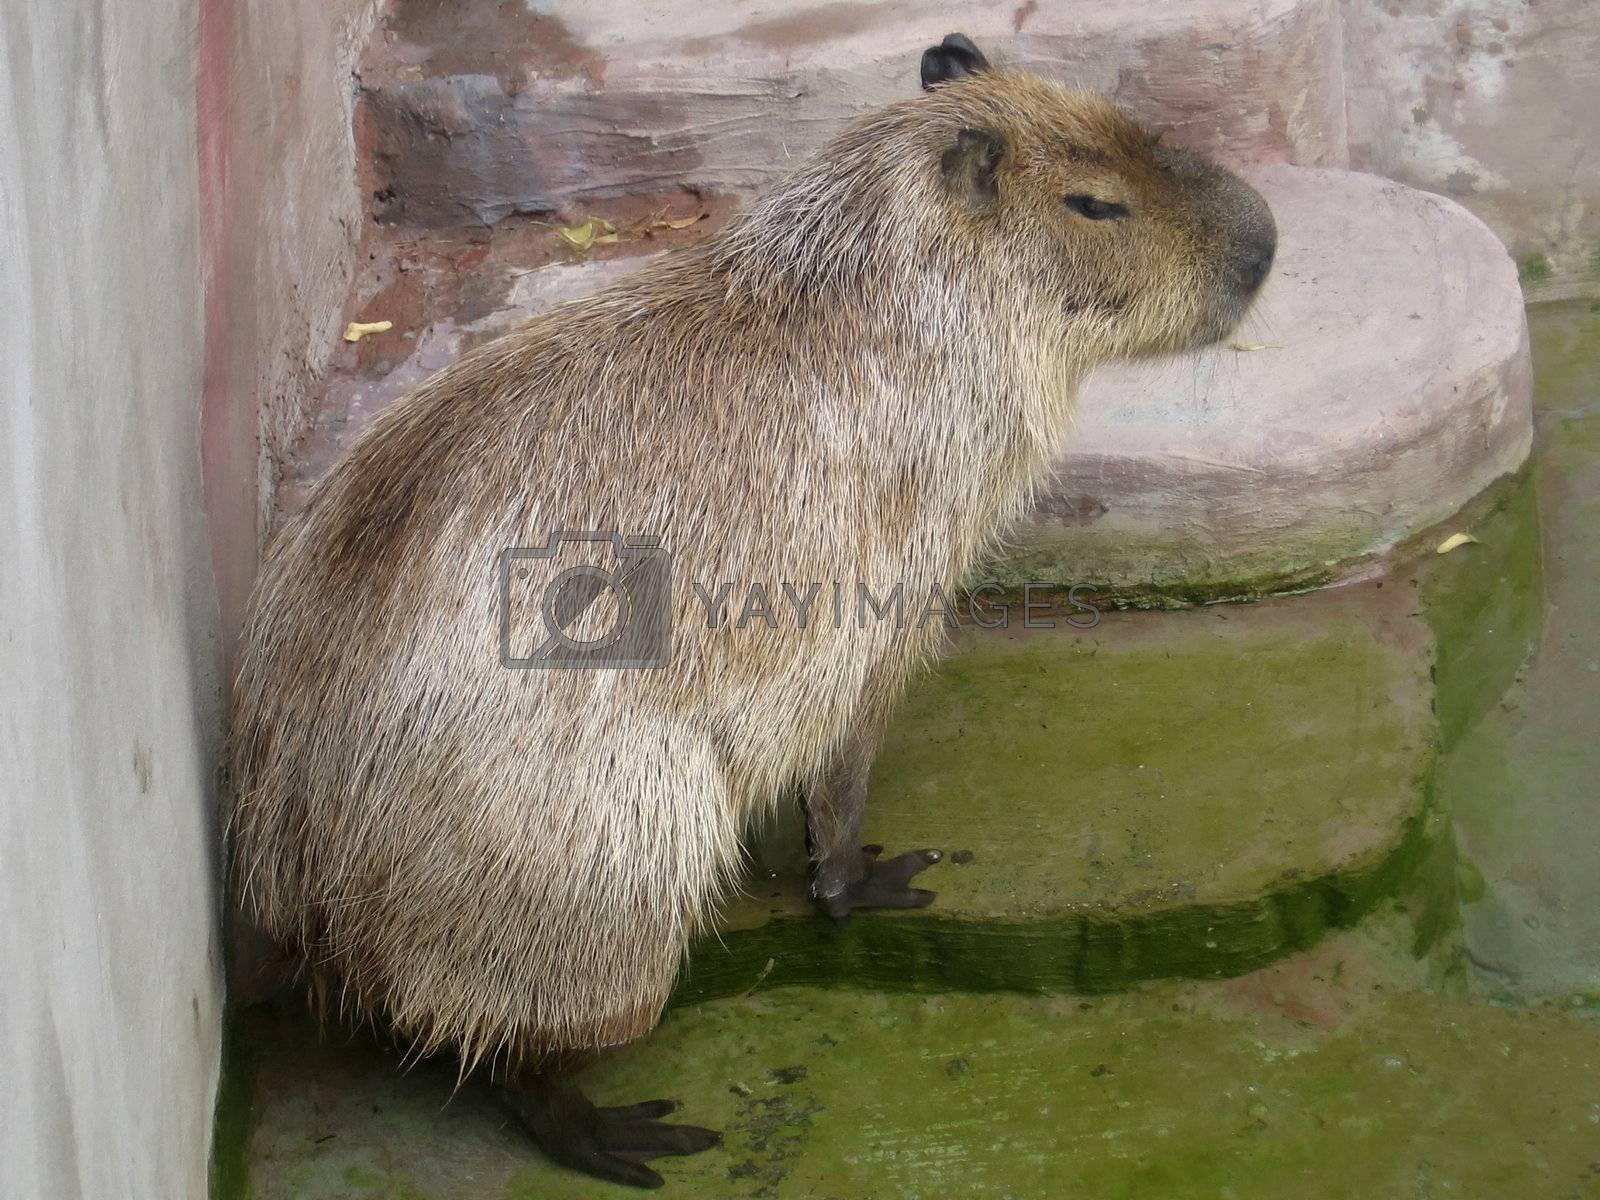 Royalty free image of Capybara by tomatto